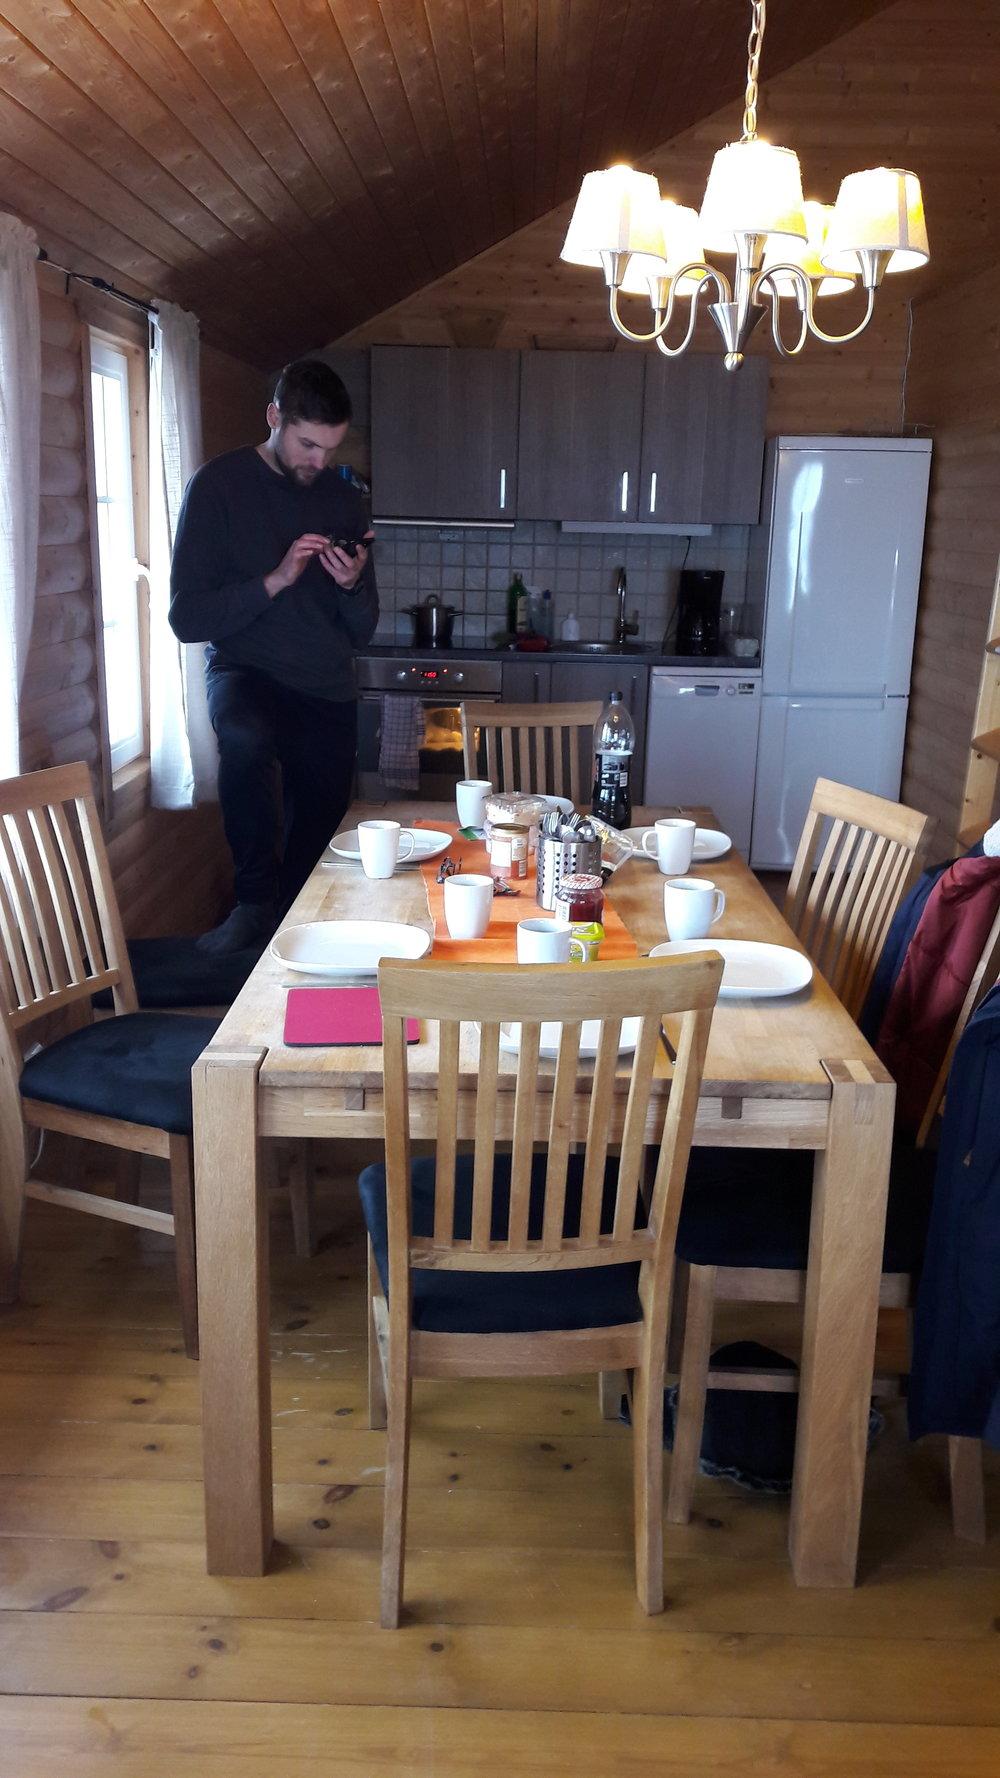 De ontbijttafel